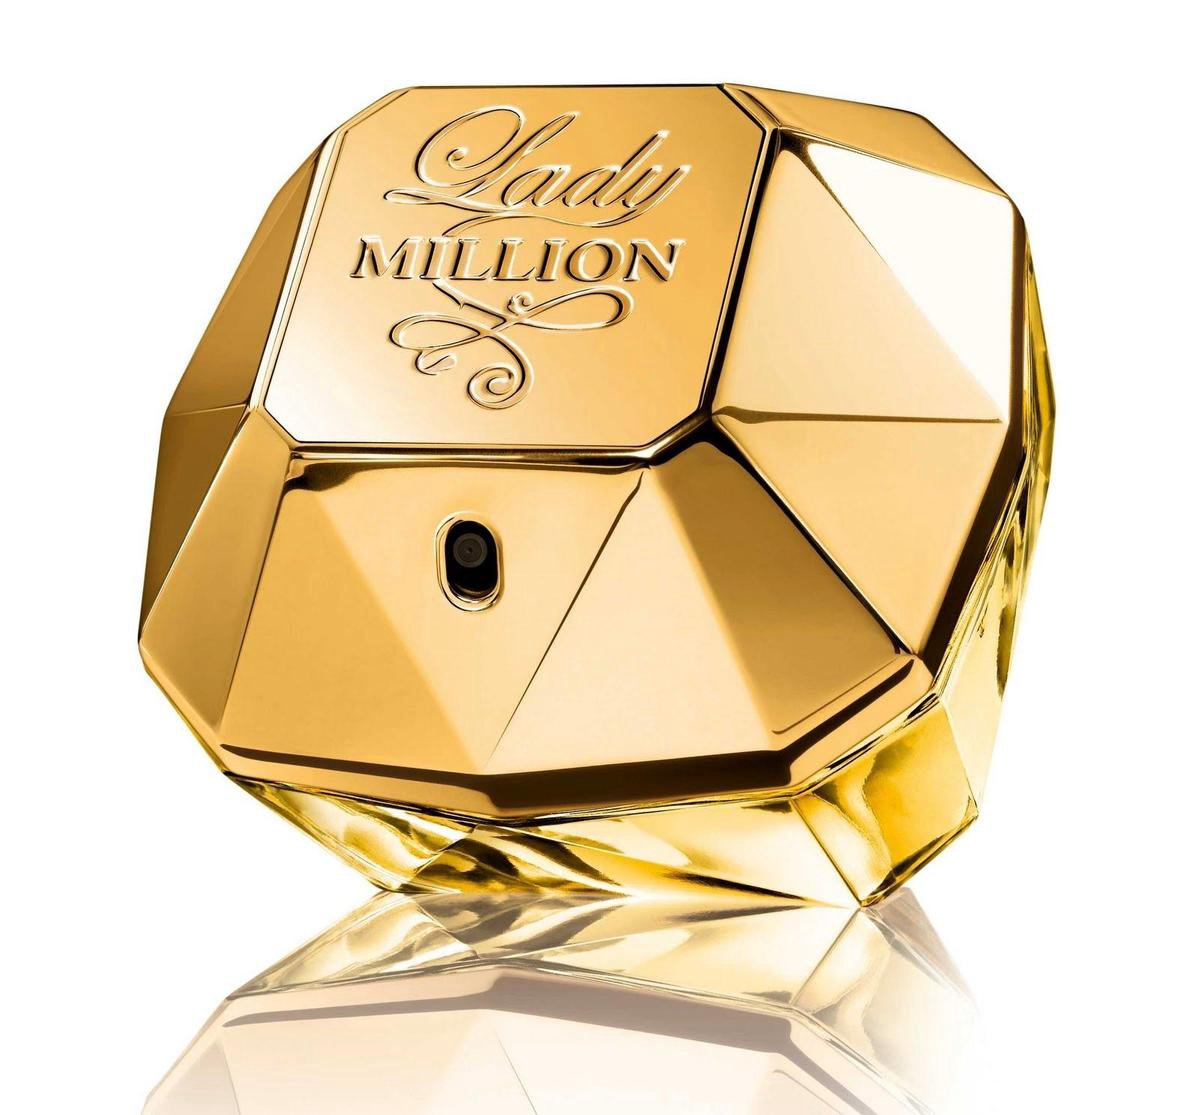 Lady Million van Paco Rabanne